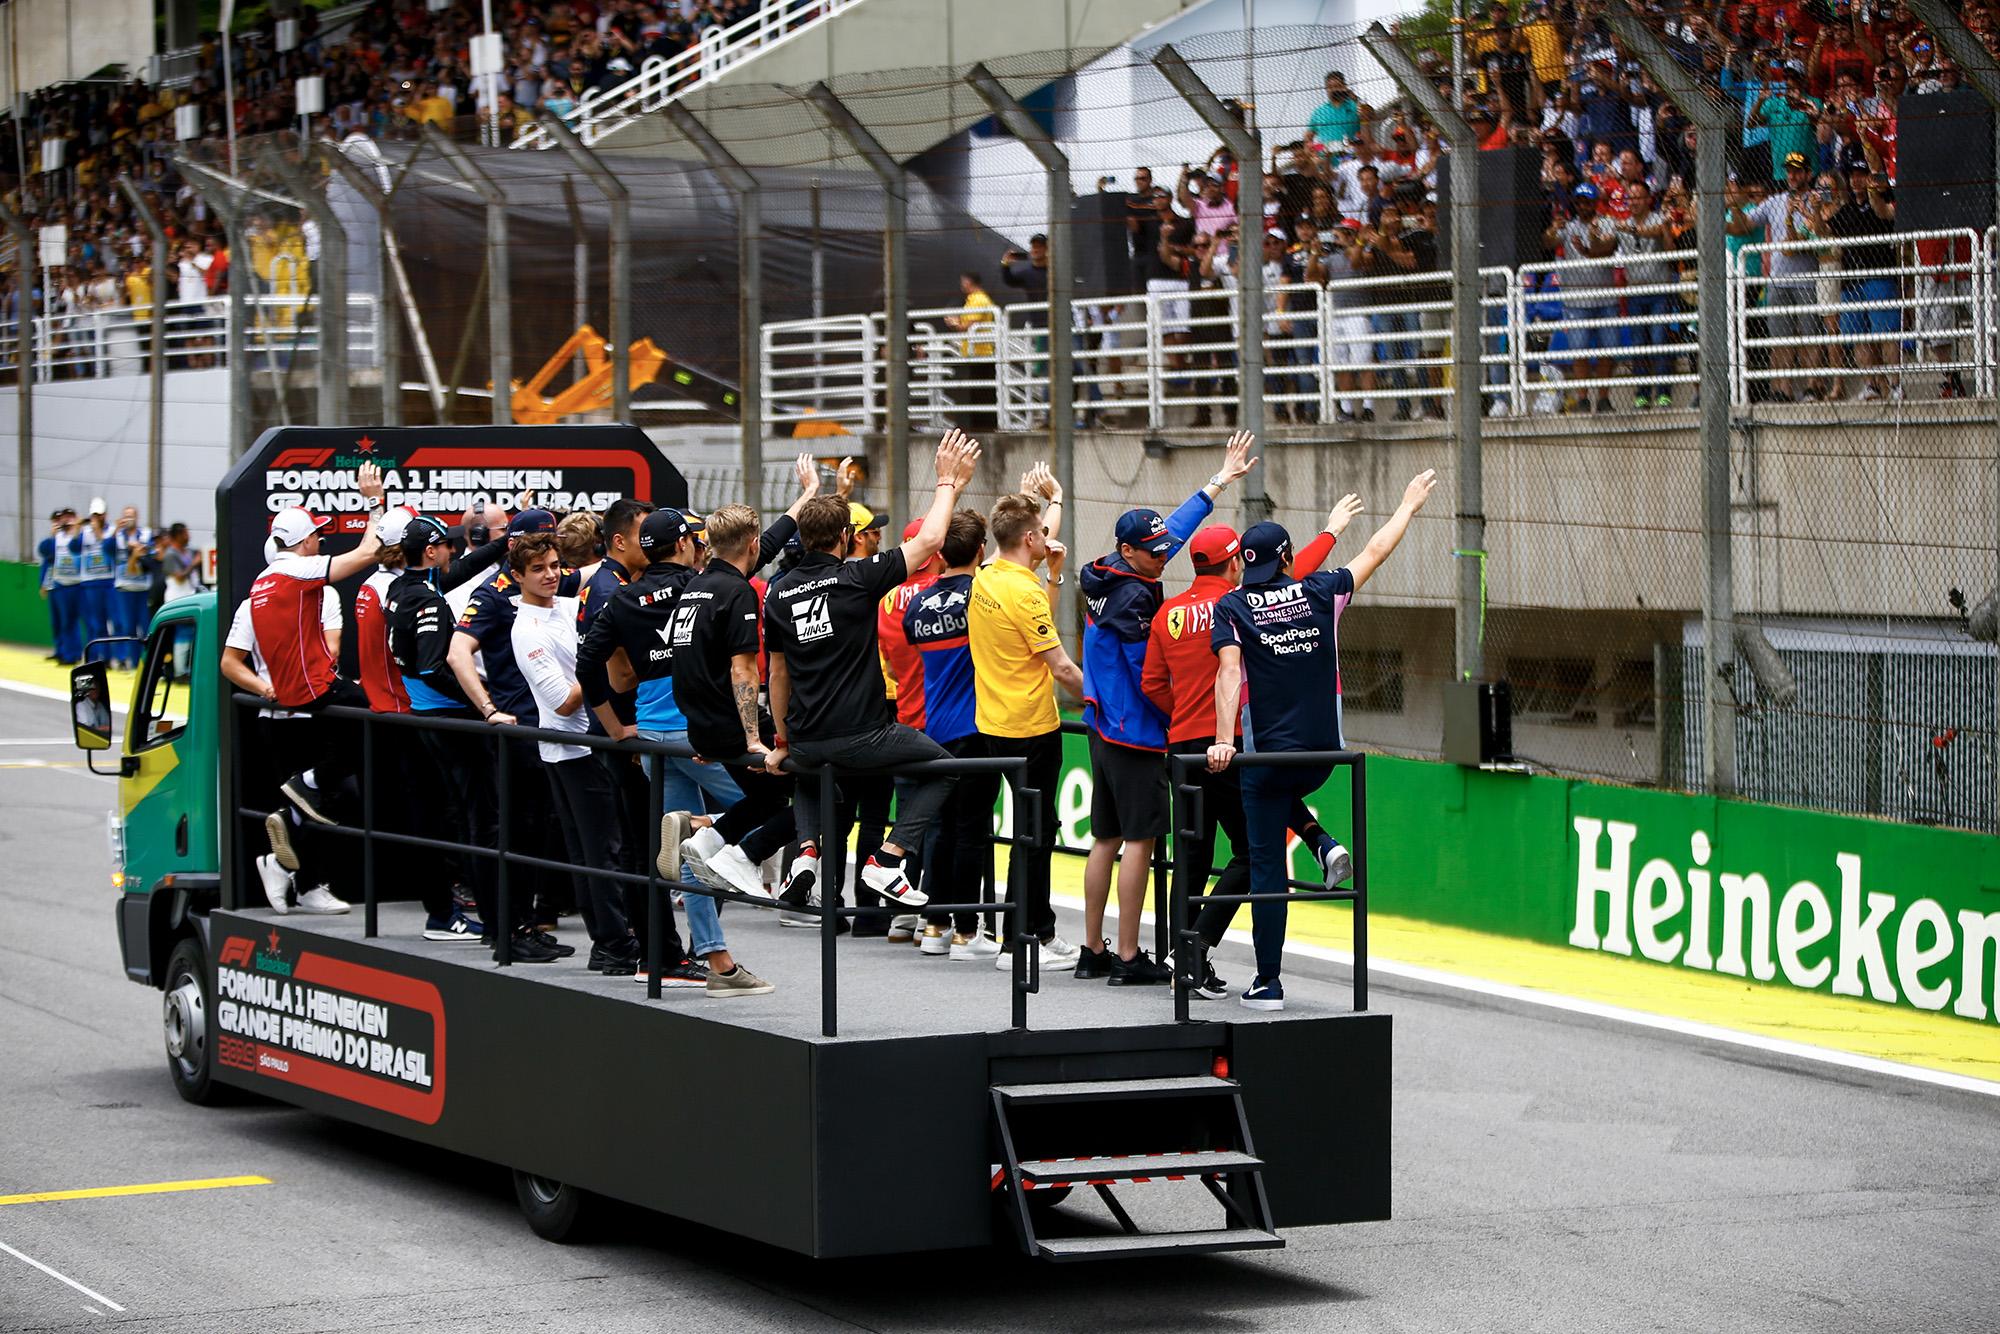 F1 drivers' parade at the 2019 Brazilian Grand Prix